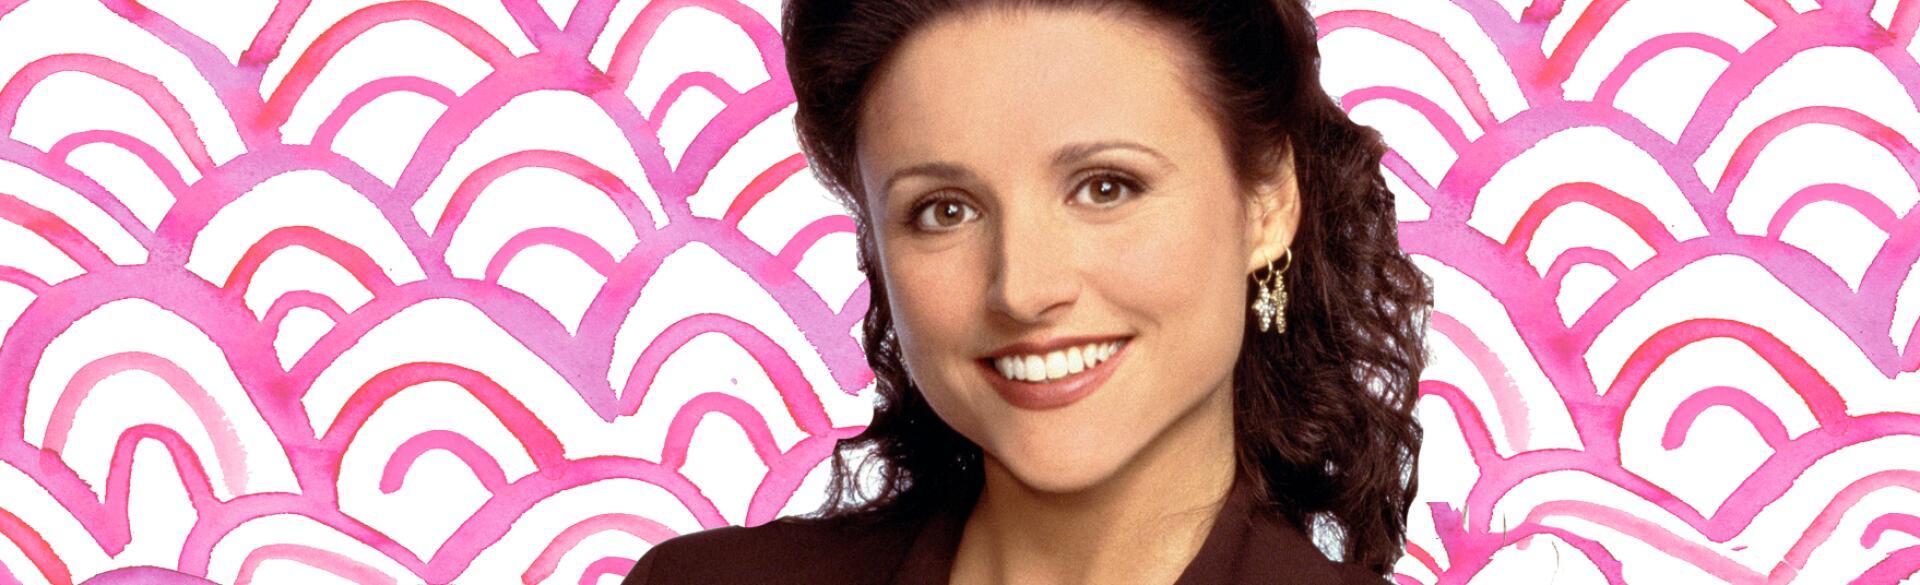 SEINFELD, Julia Louis-Dreyfus, Season 7. 1990 - 1998. (c) Columbia TriStar Television/ Courtesy: Eve